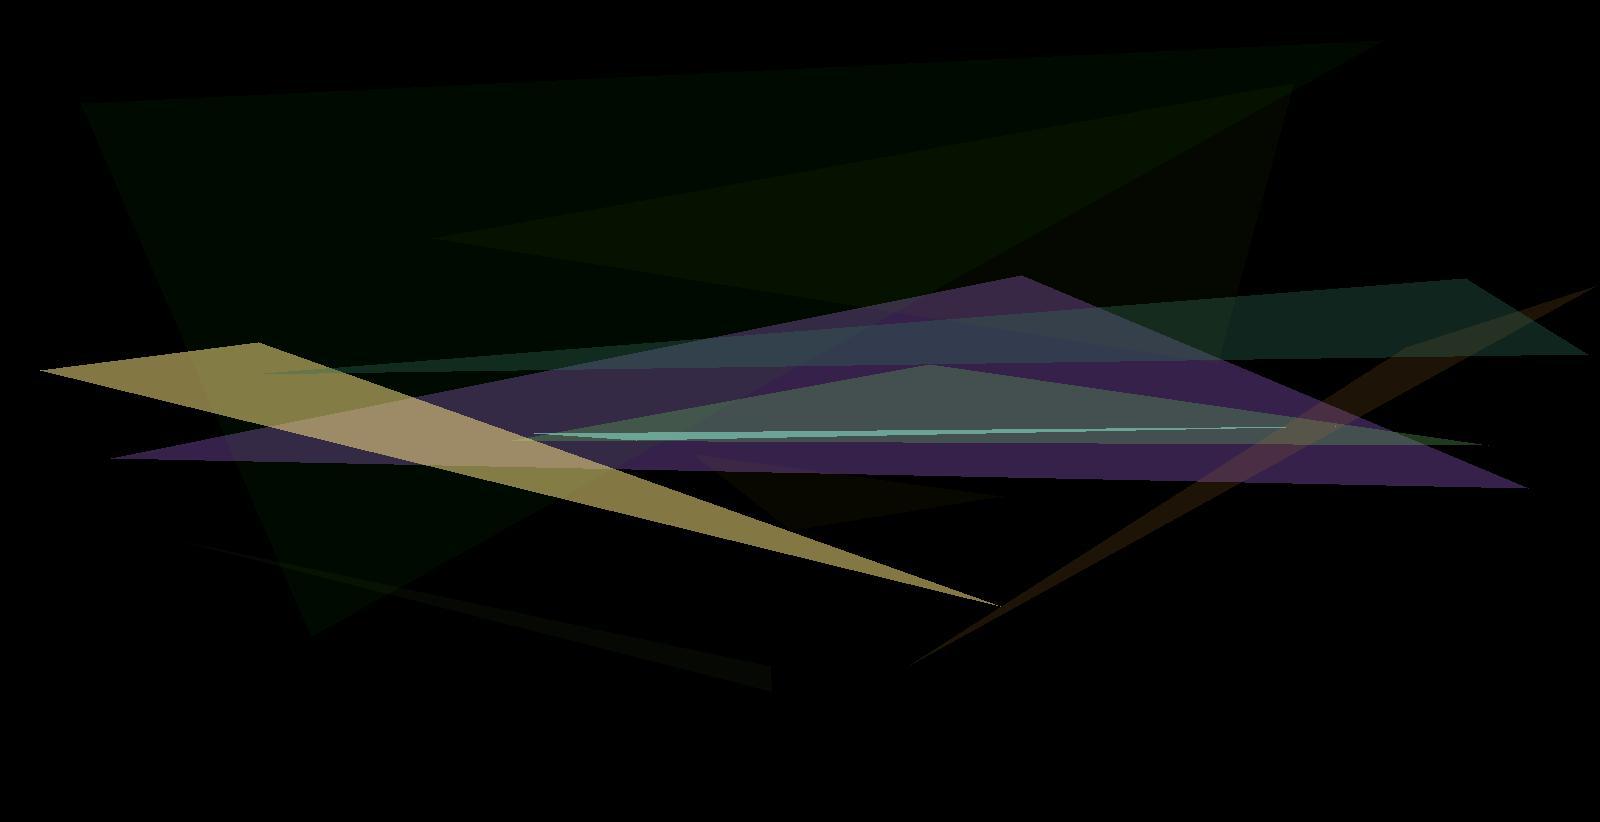 generation 81-89.108062_per_cent-10_brush_strokes.jpg